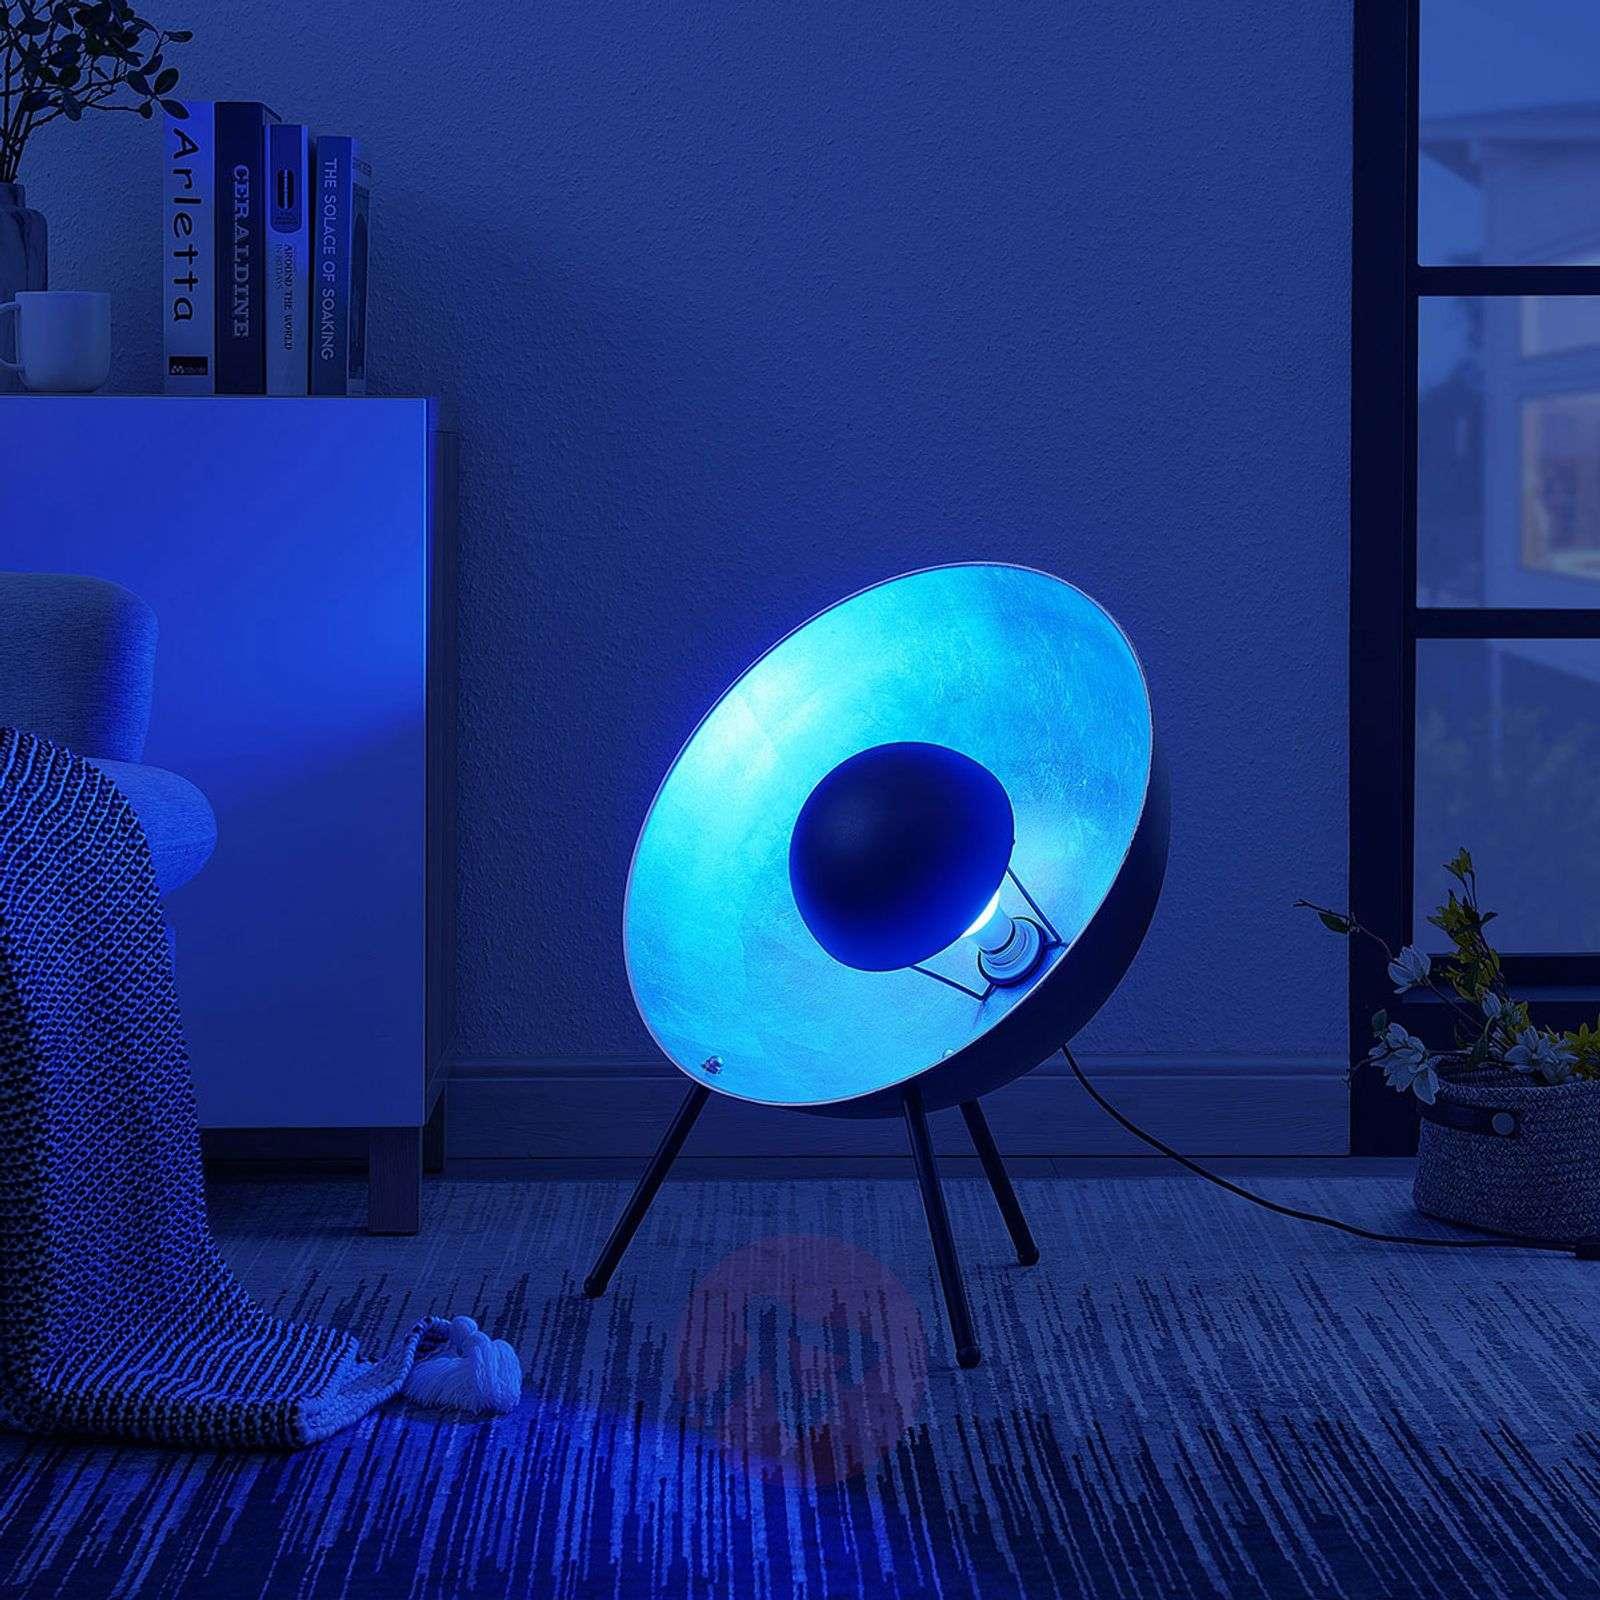 Lindby Smart LED-pöytävalaisin Muriel 60 cm, hopea-9624225-02